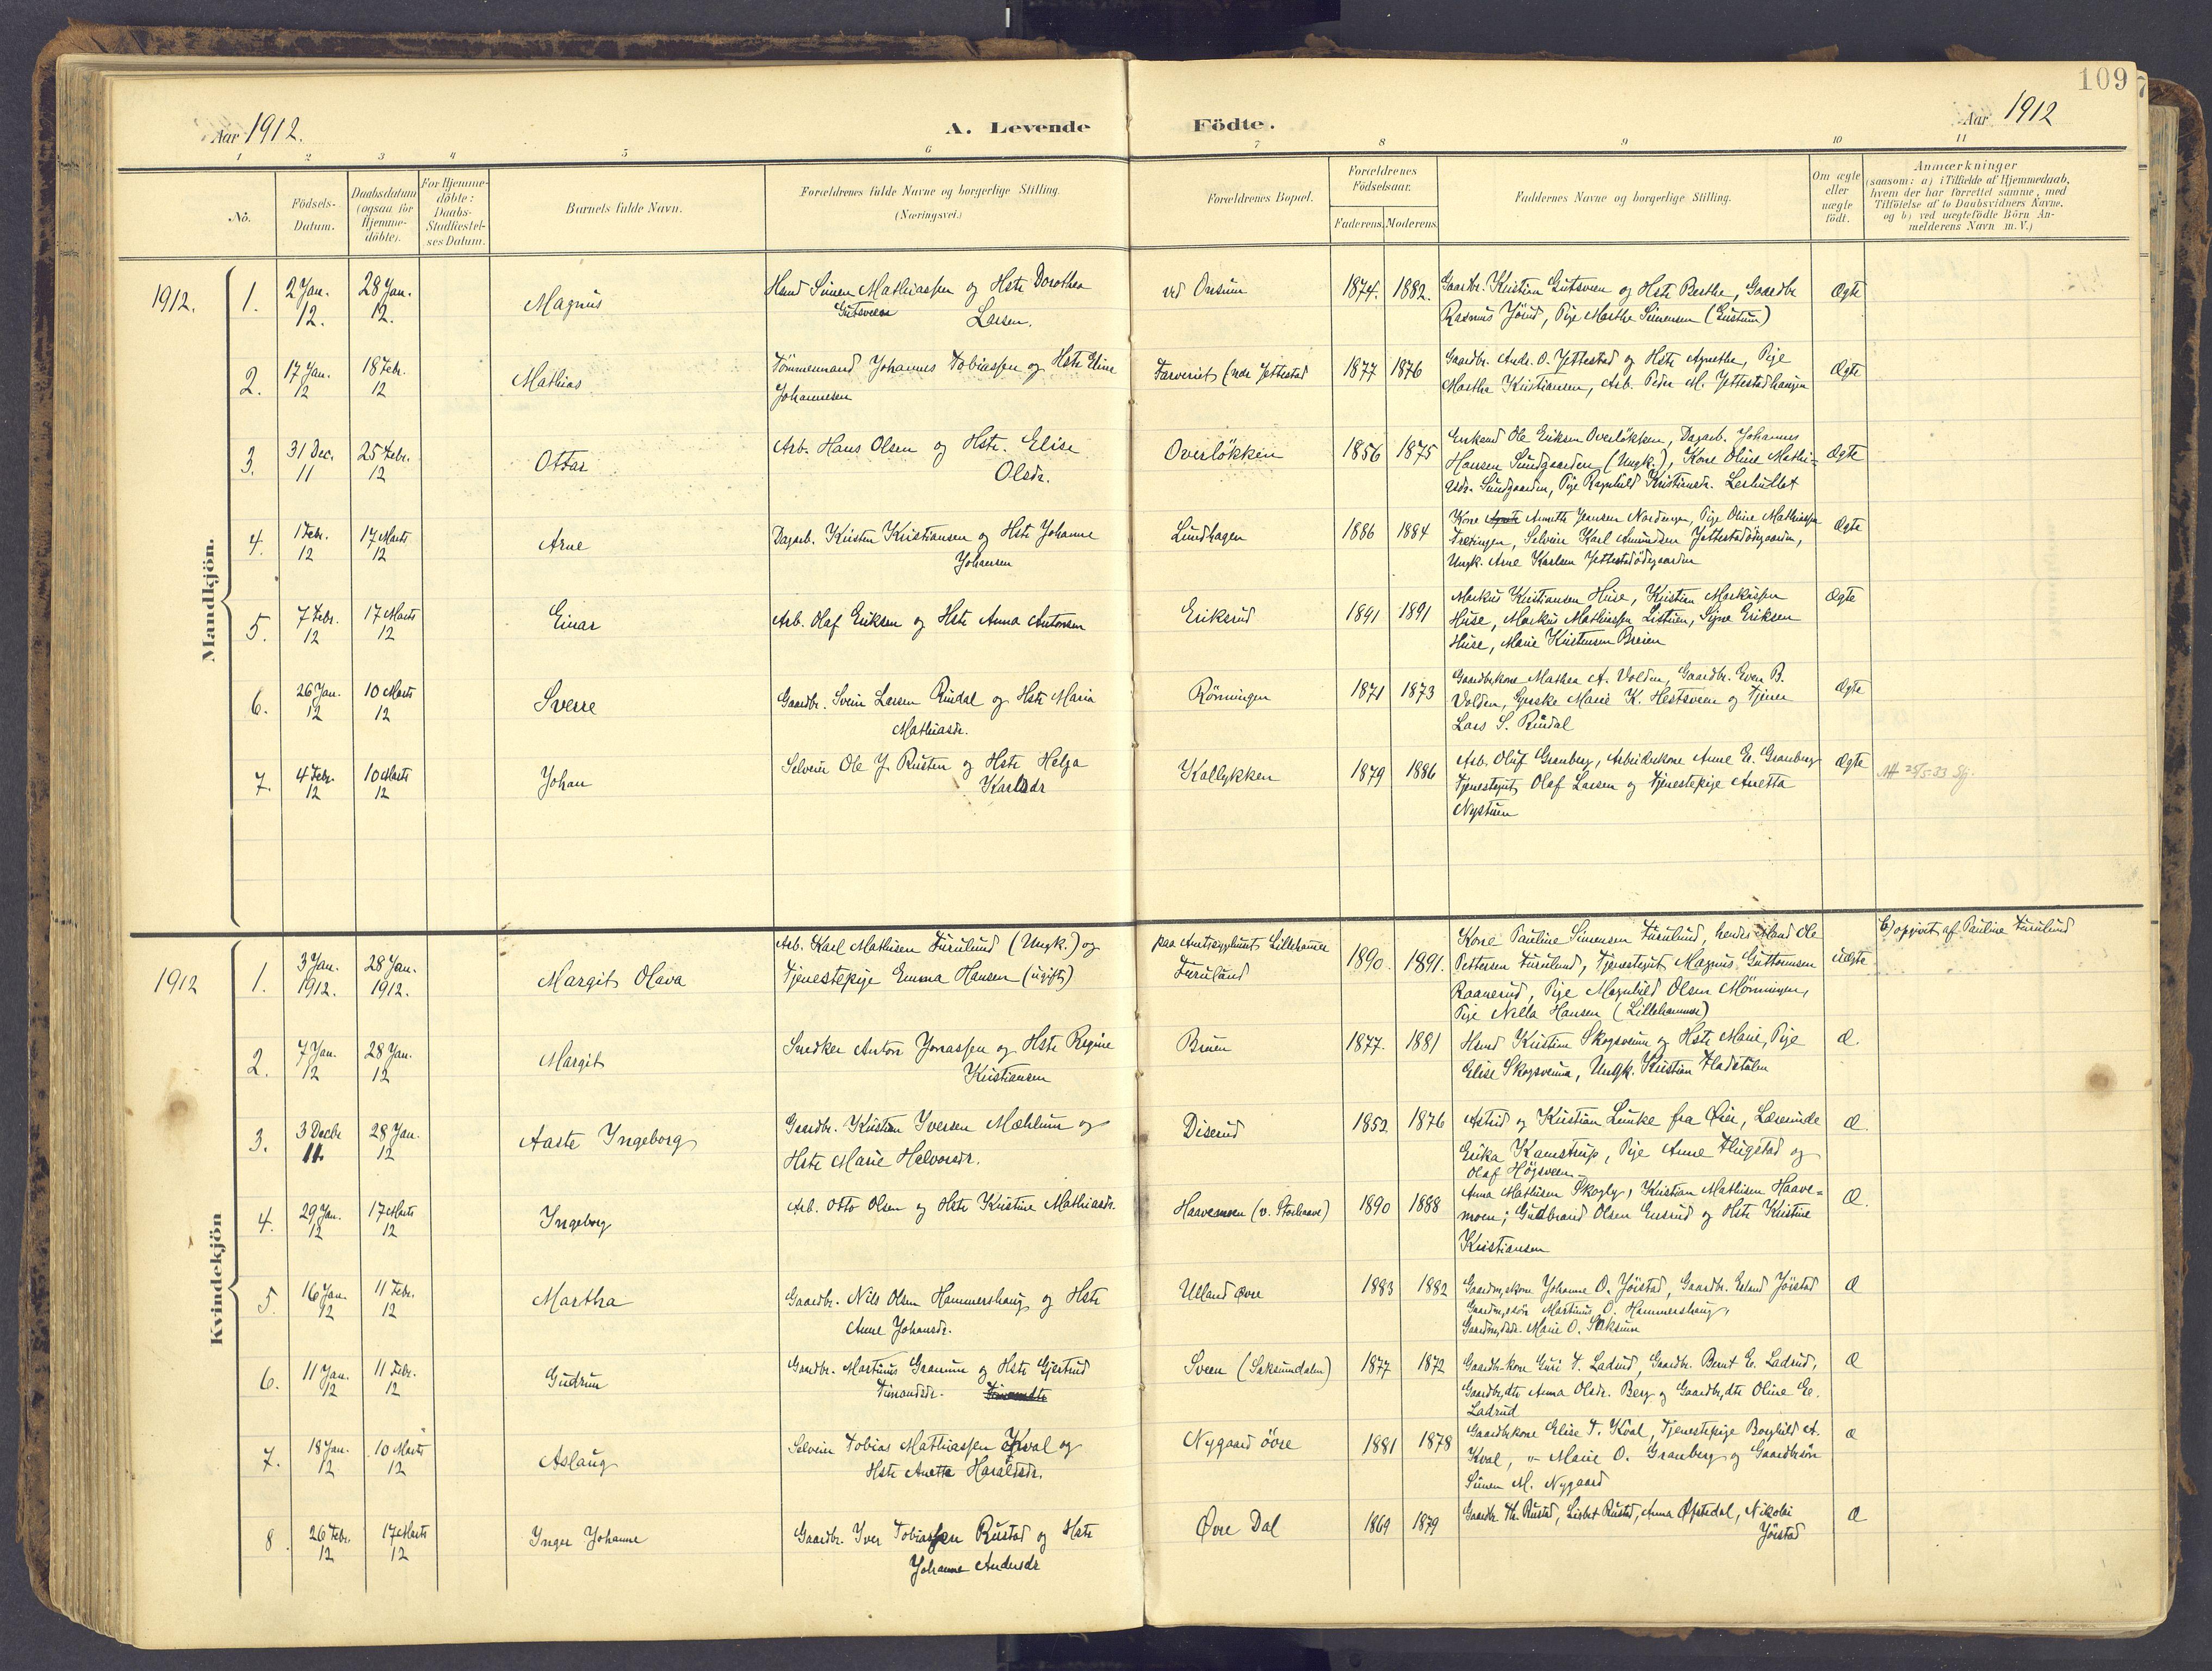 SAH, Fåberg prestekontor, Ministerialbok nr. 12, 1899-1915, s. 109